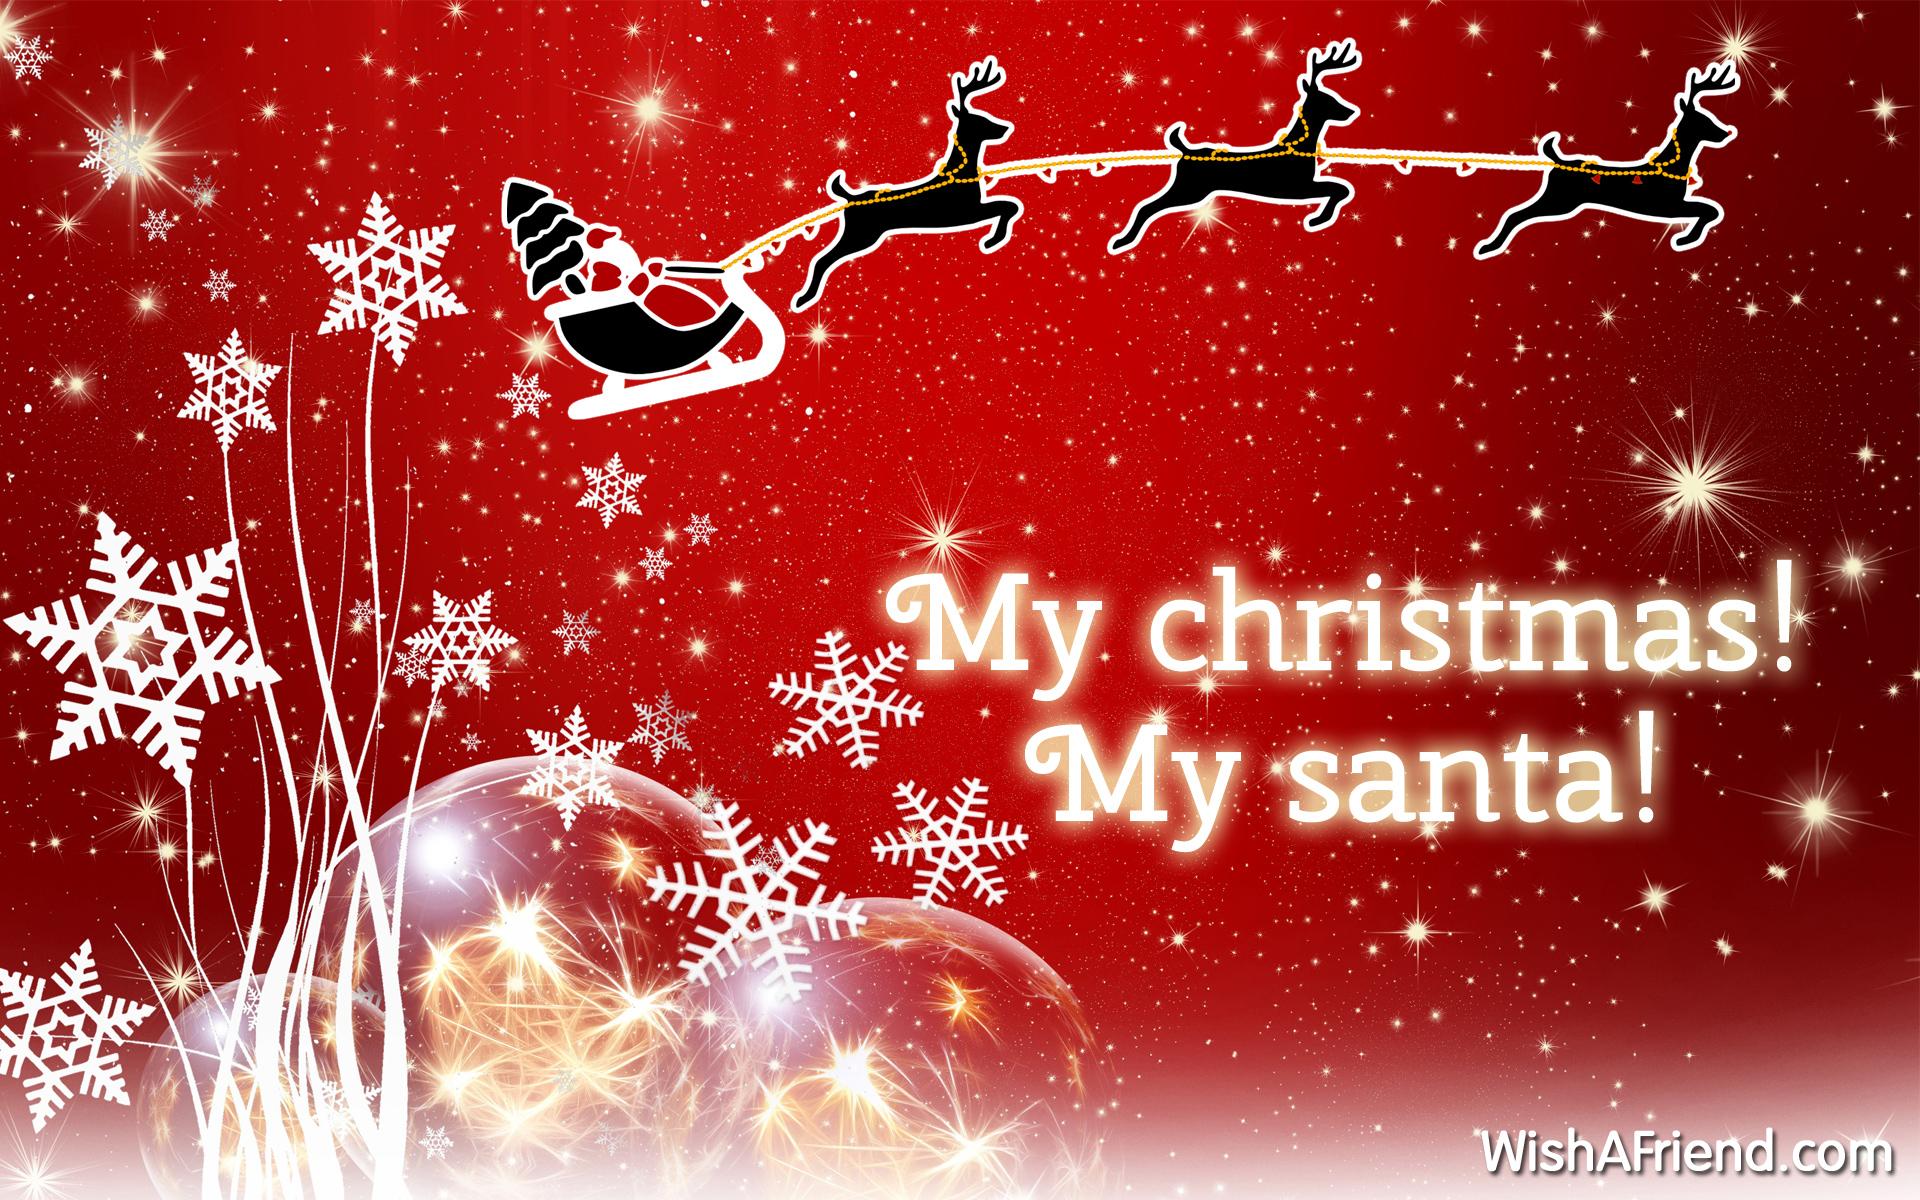 My Christmas! My Santa!